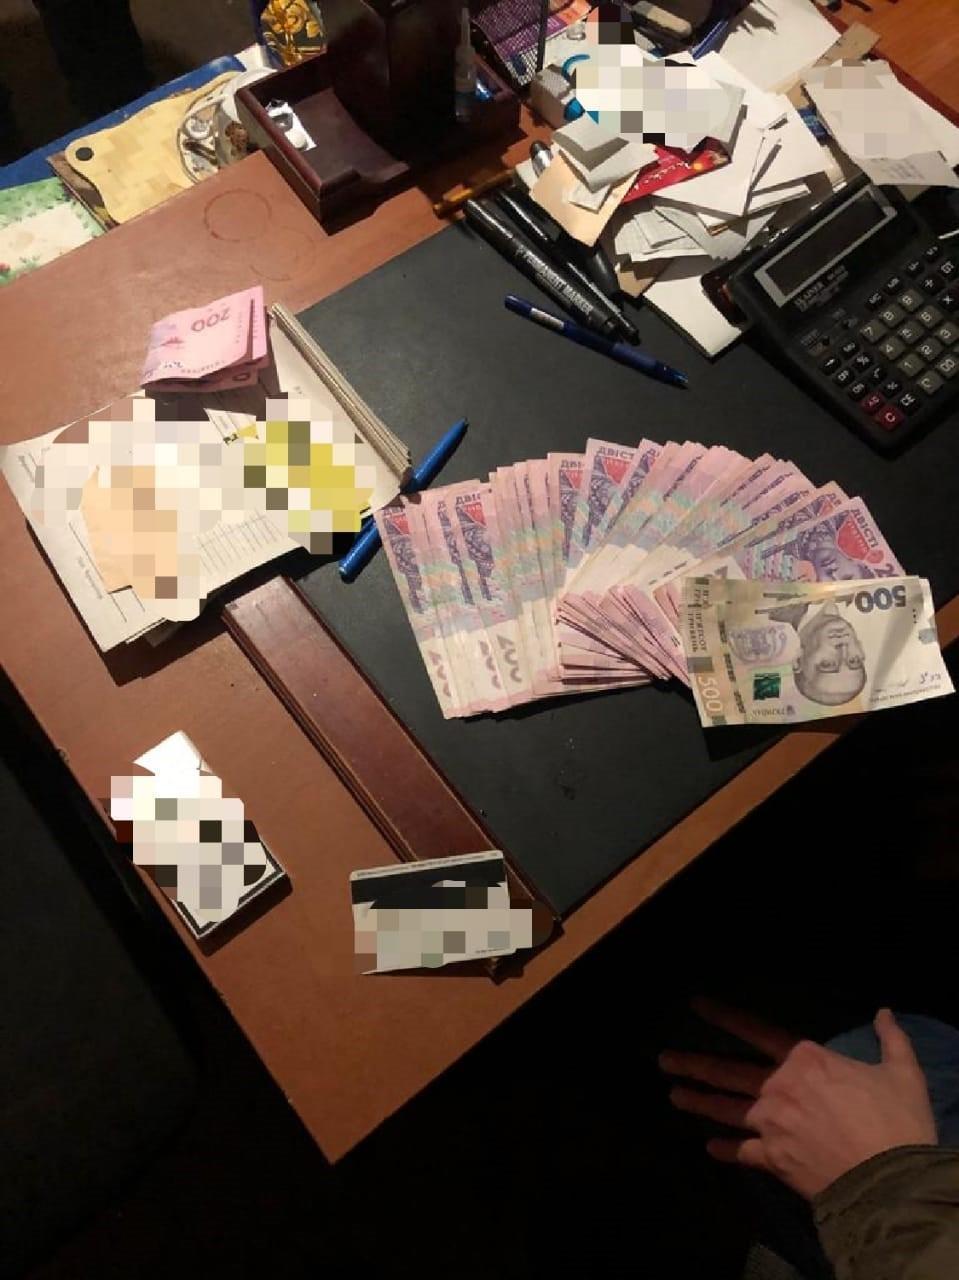 обшук, поліція, гроші